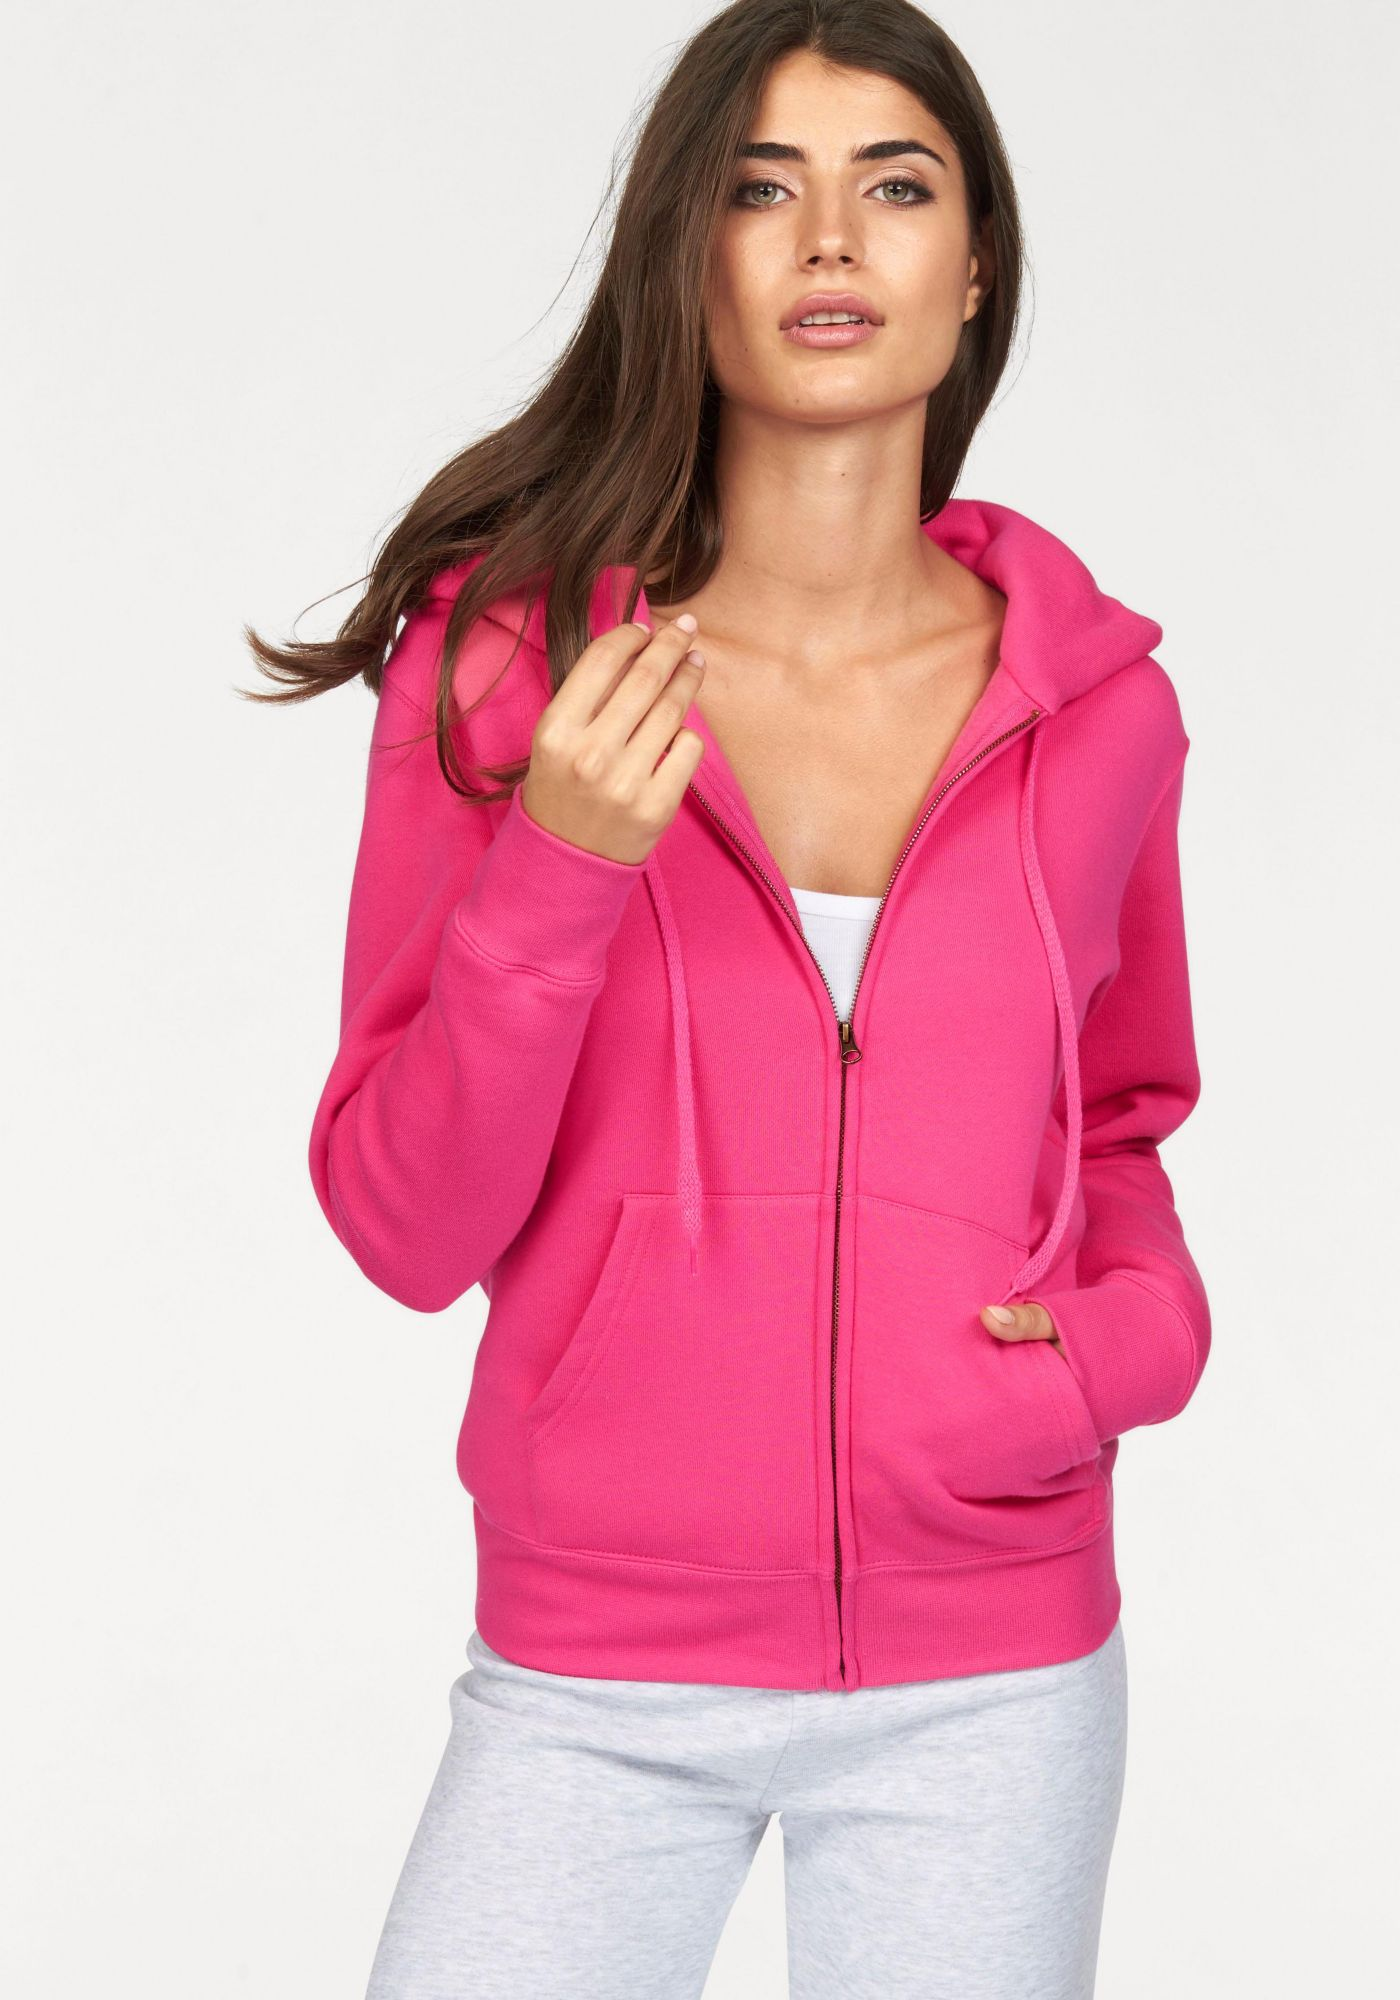 FRUIT OF THE LOOM Fruit of the Loom Kapuzensweatshirt »Lady-Fit Premium hooded Sweat Jacket«